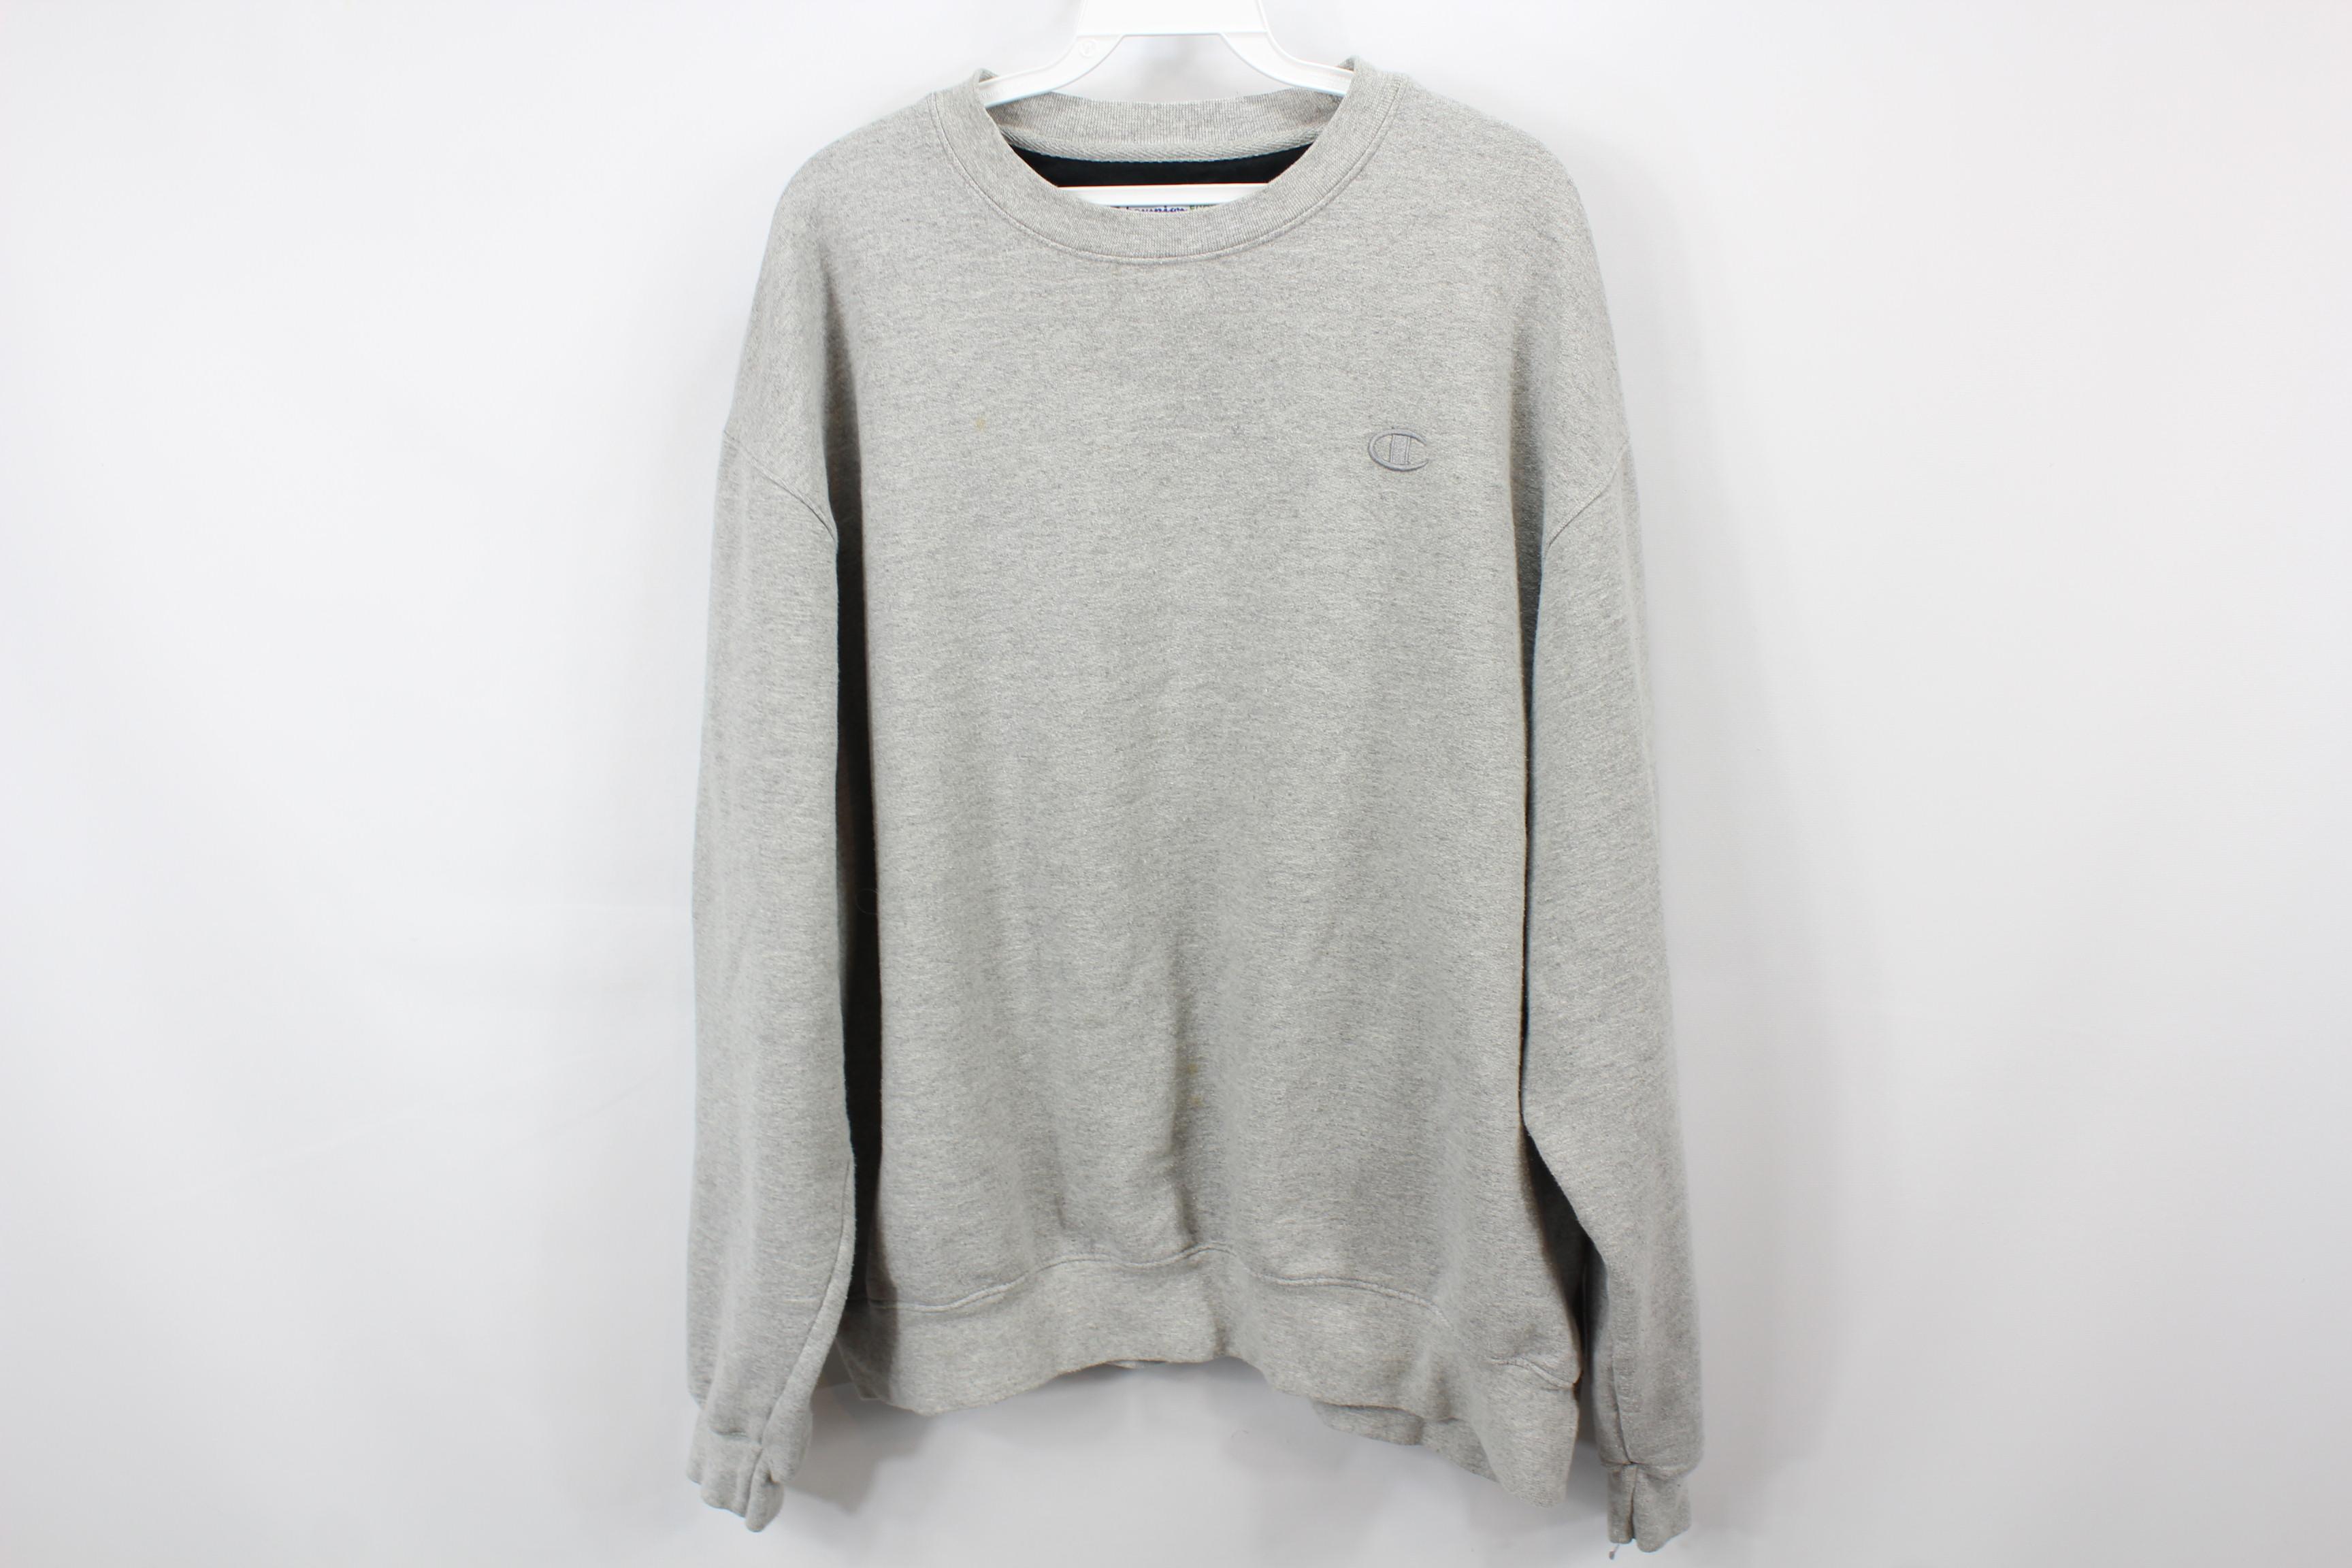 8fa722ea Champion ×. Vintage 90s CHAMPION Mens XL Long Sleeve Crewneck Sweatshirt ...